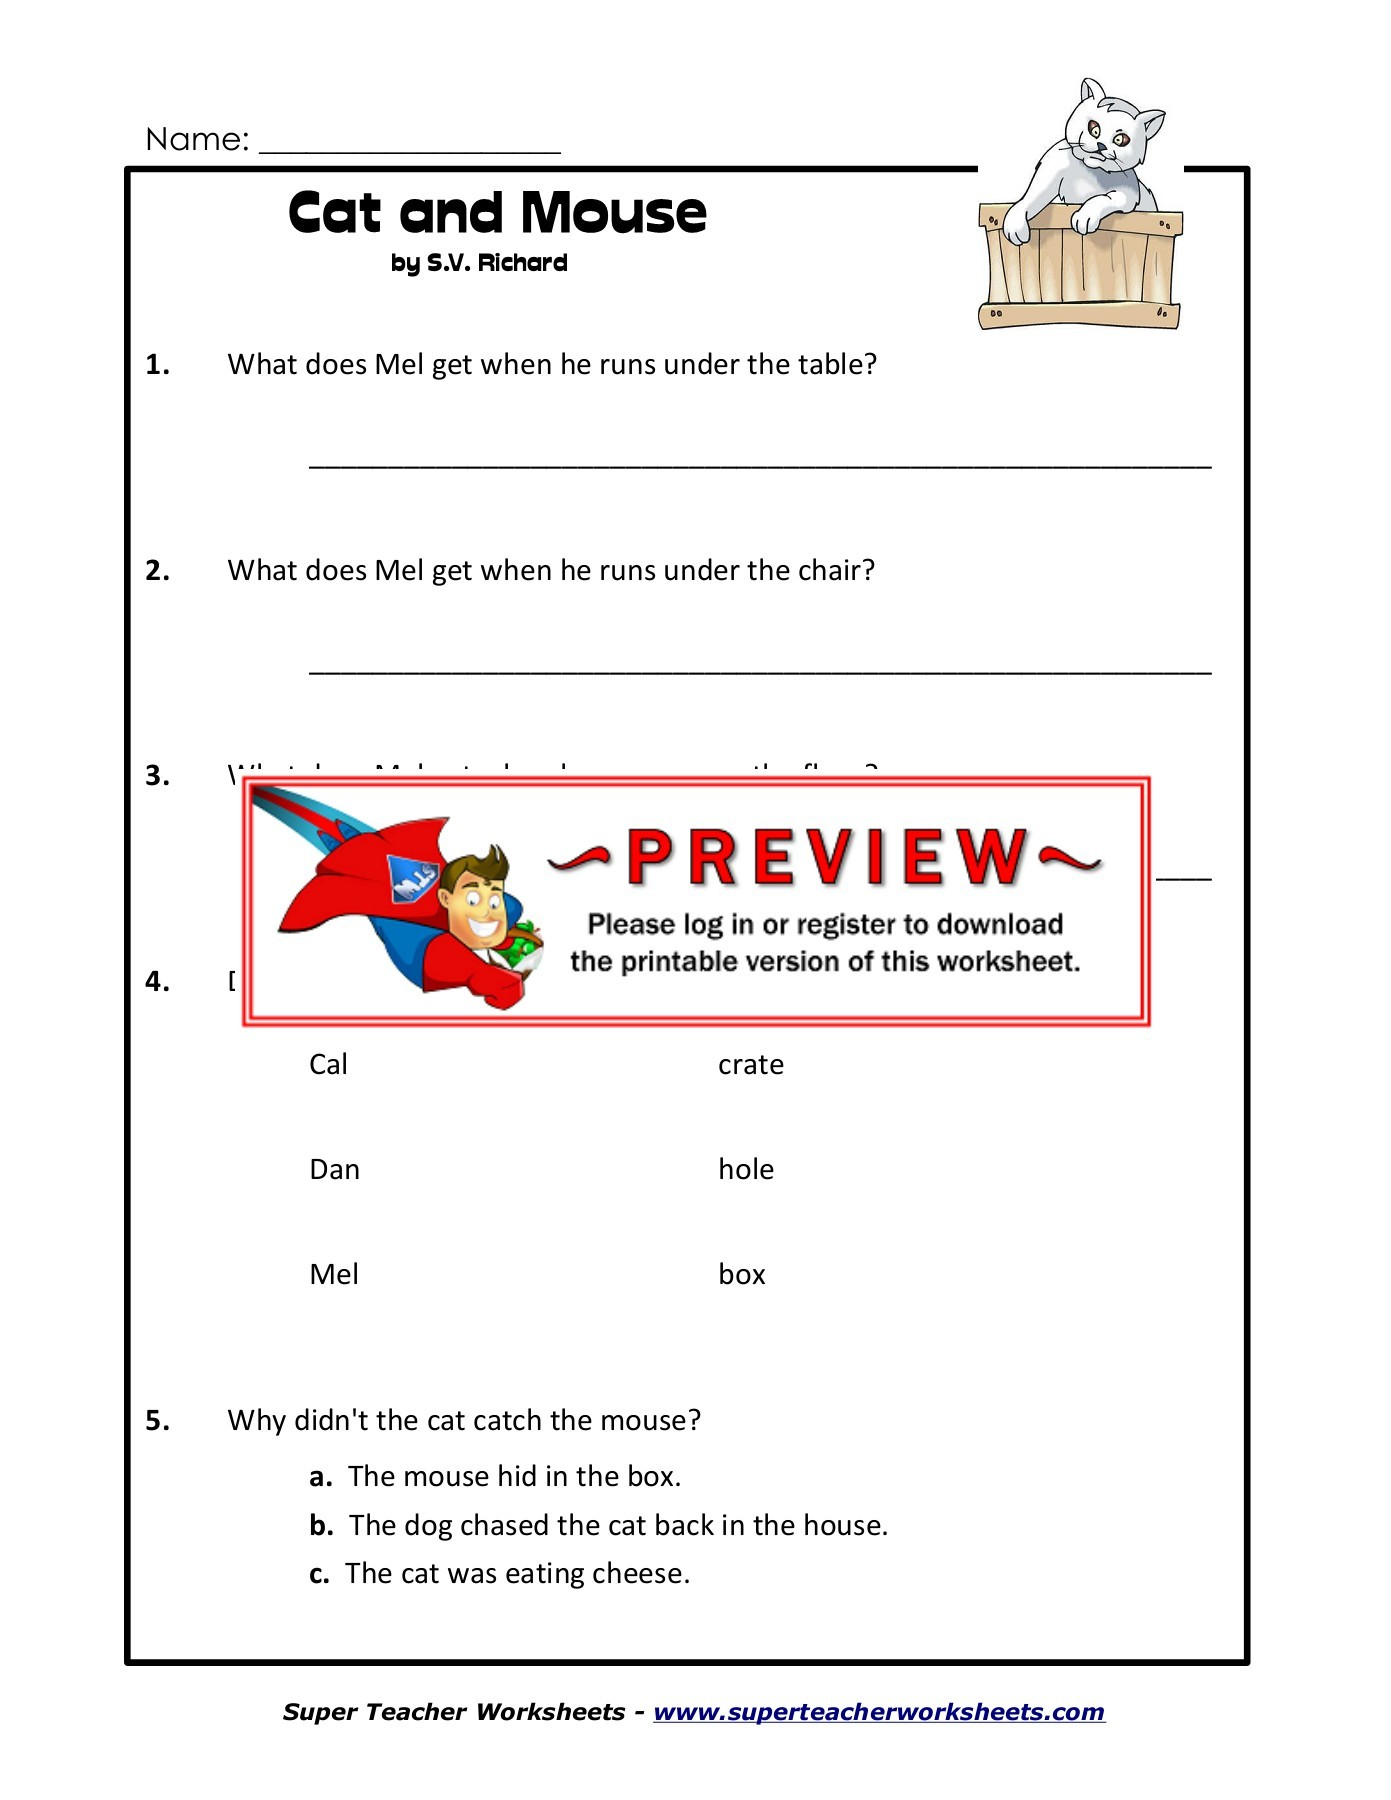 Printables Of Super Teacher Worksheet Holes